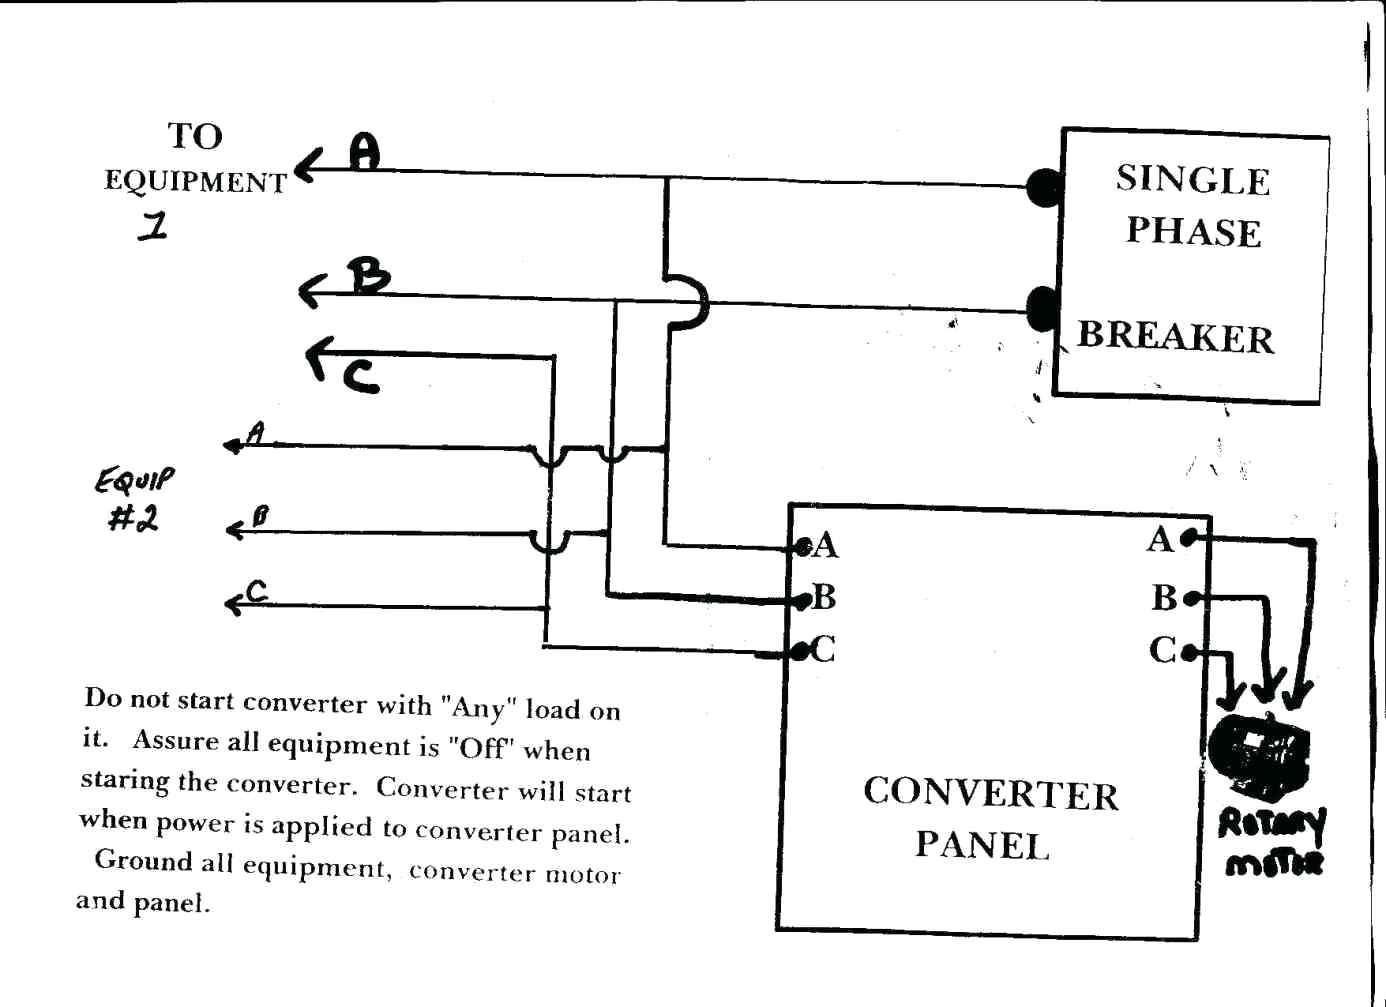 Shunt Trip Breaker Wiring Diagram from i0.wp.com